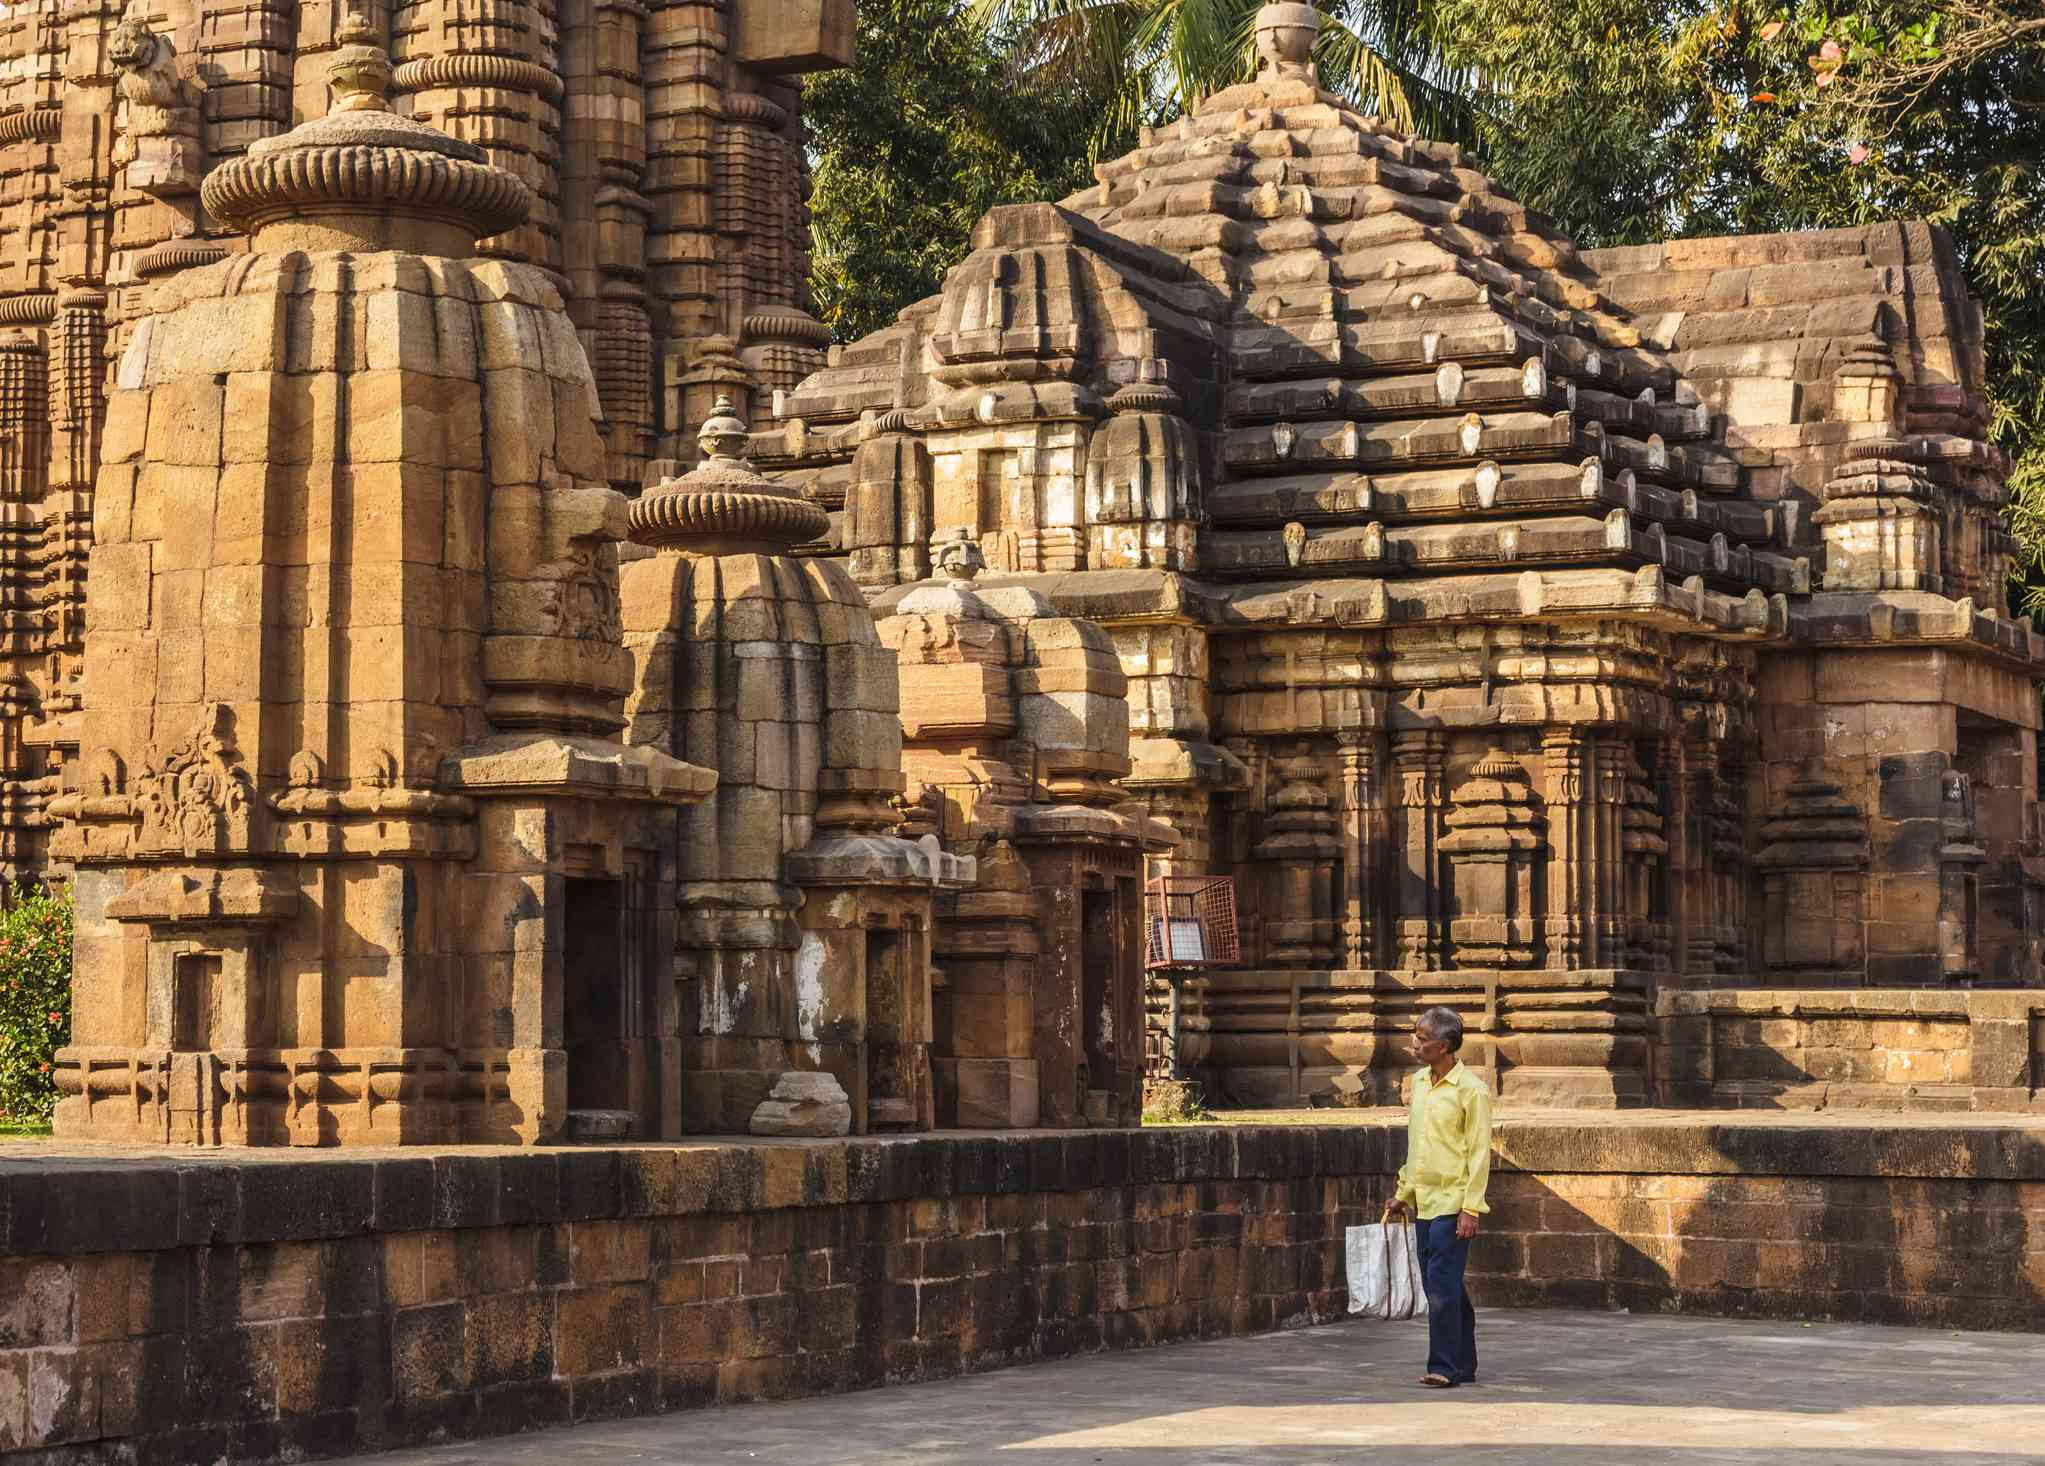 Temple in Bhubaneshwar, Odisha.